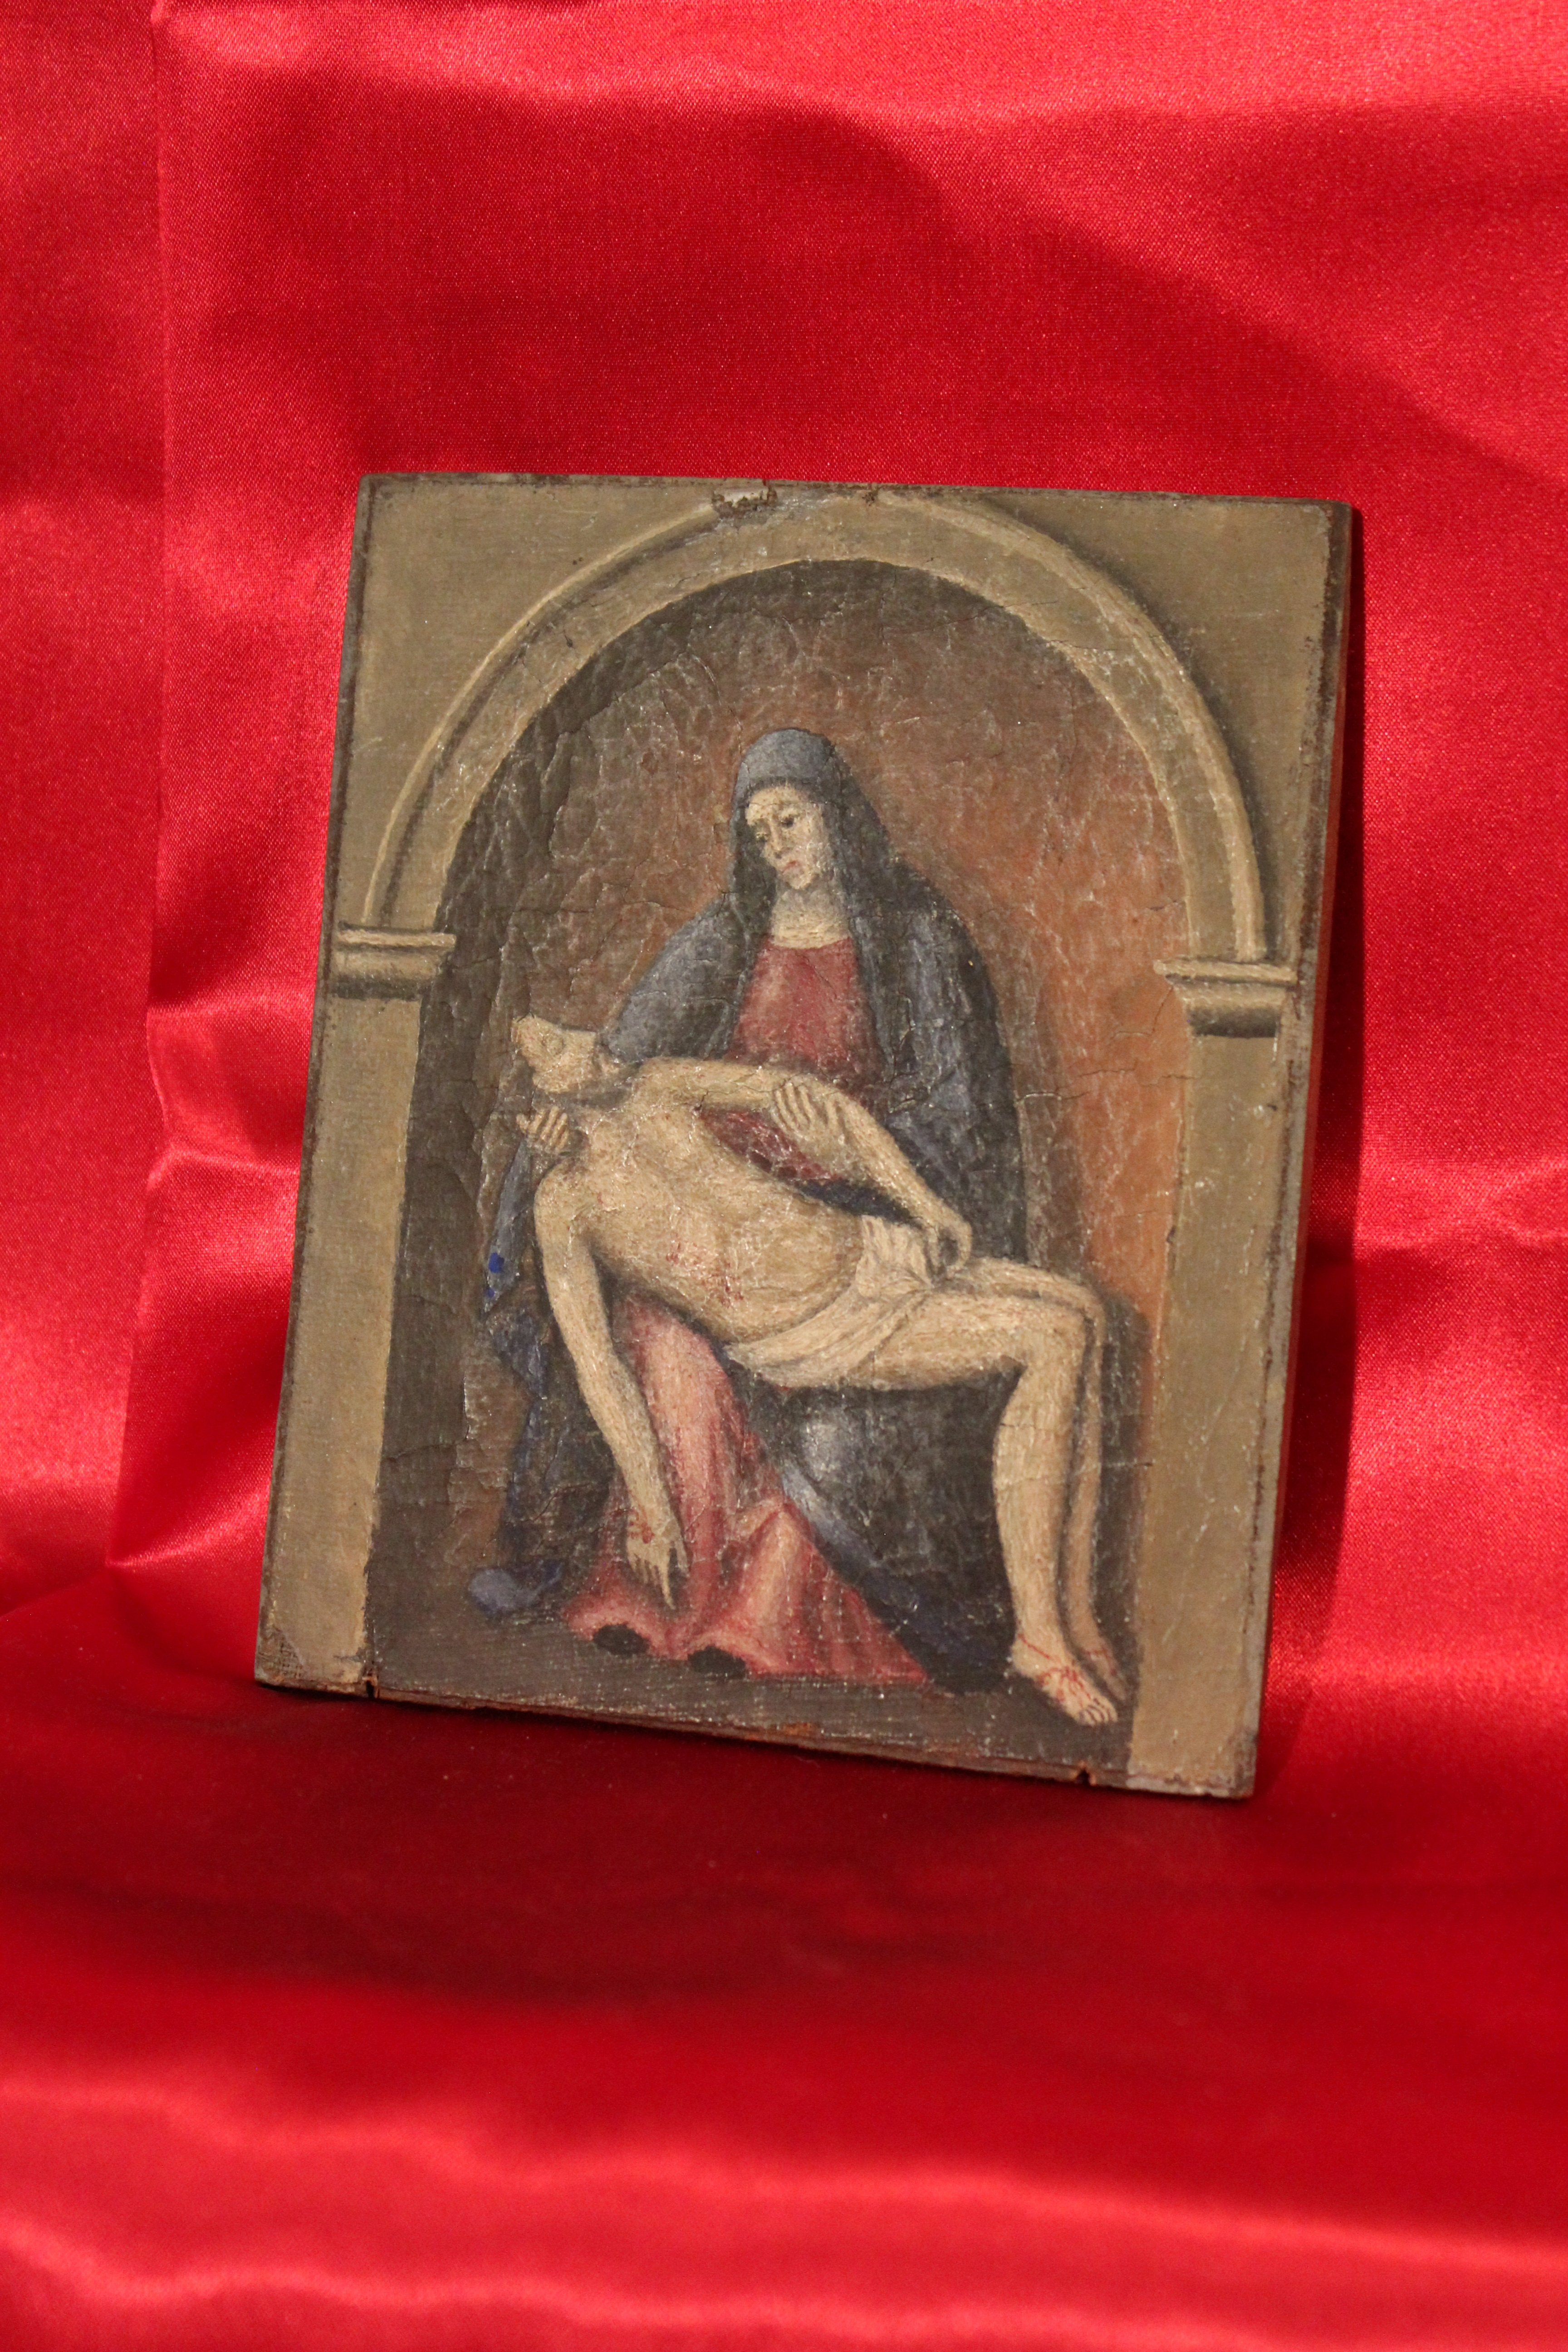 PETITE PEINTURE ANCIENNE REPRESENTANT UNE PIETA CHRIST école italienne RELIGION  - IMG_1349